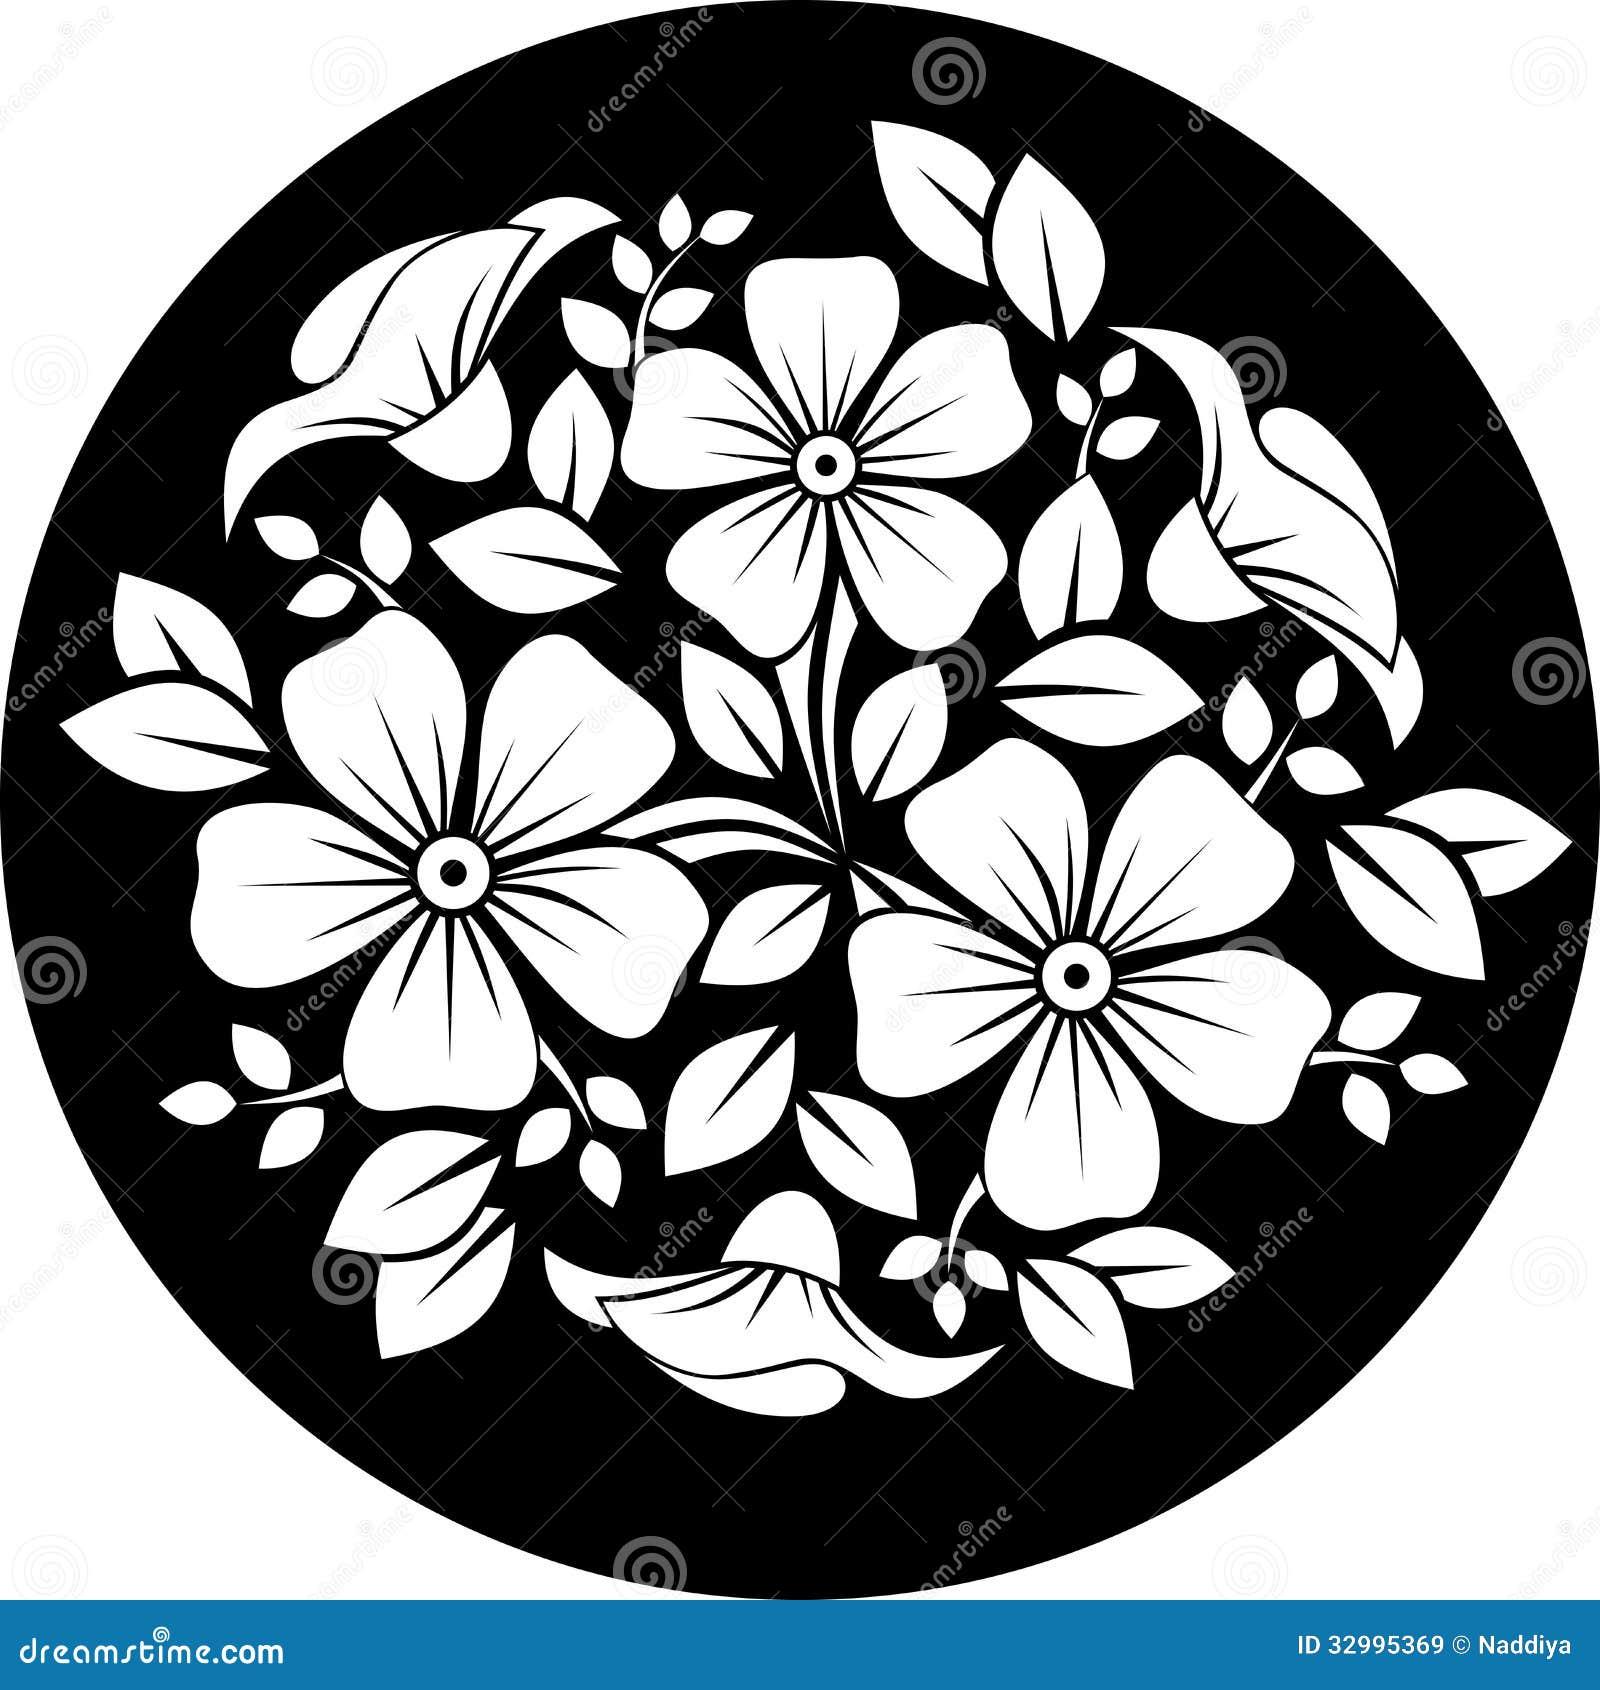 Black Flower On White Background Royalty Free Stock: White Flower Ornament On A Black Background. Royalty Free